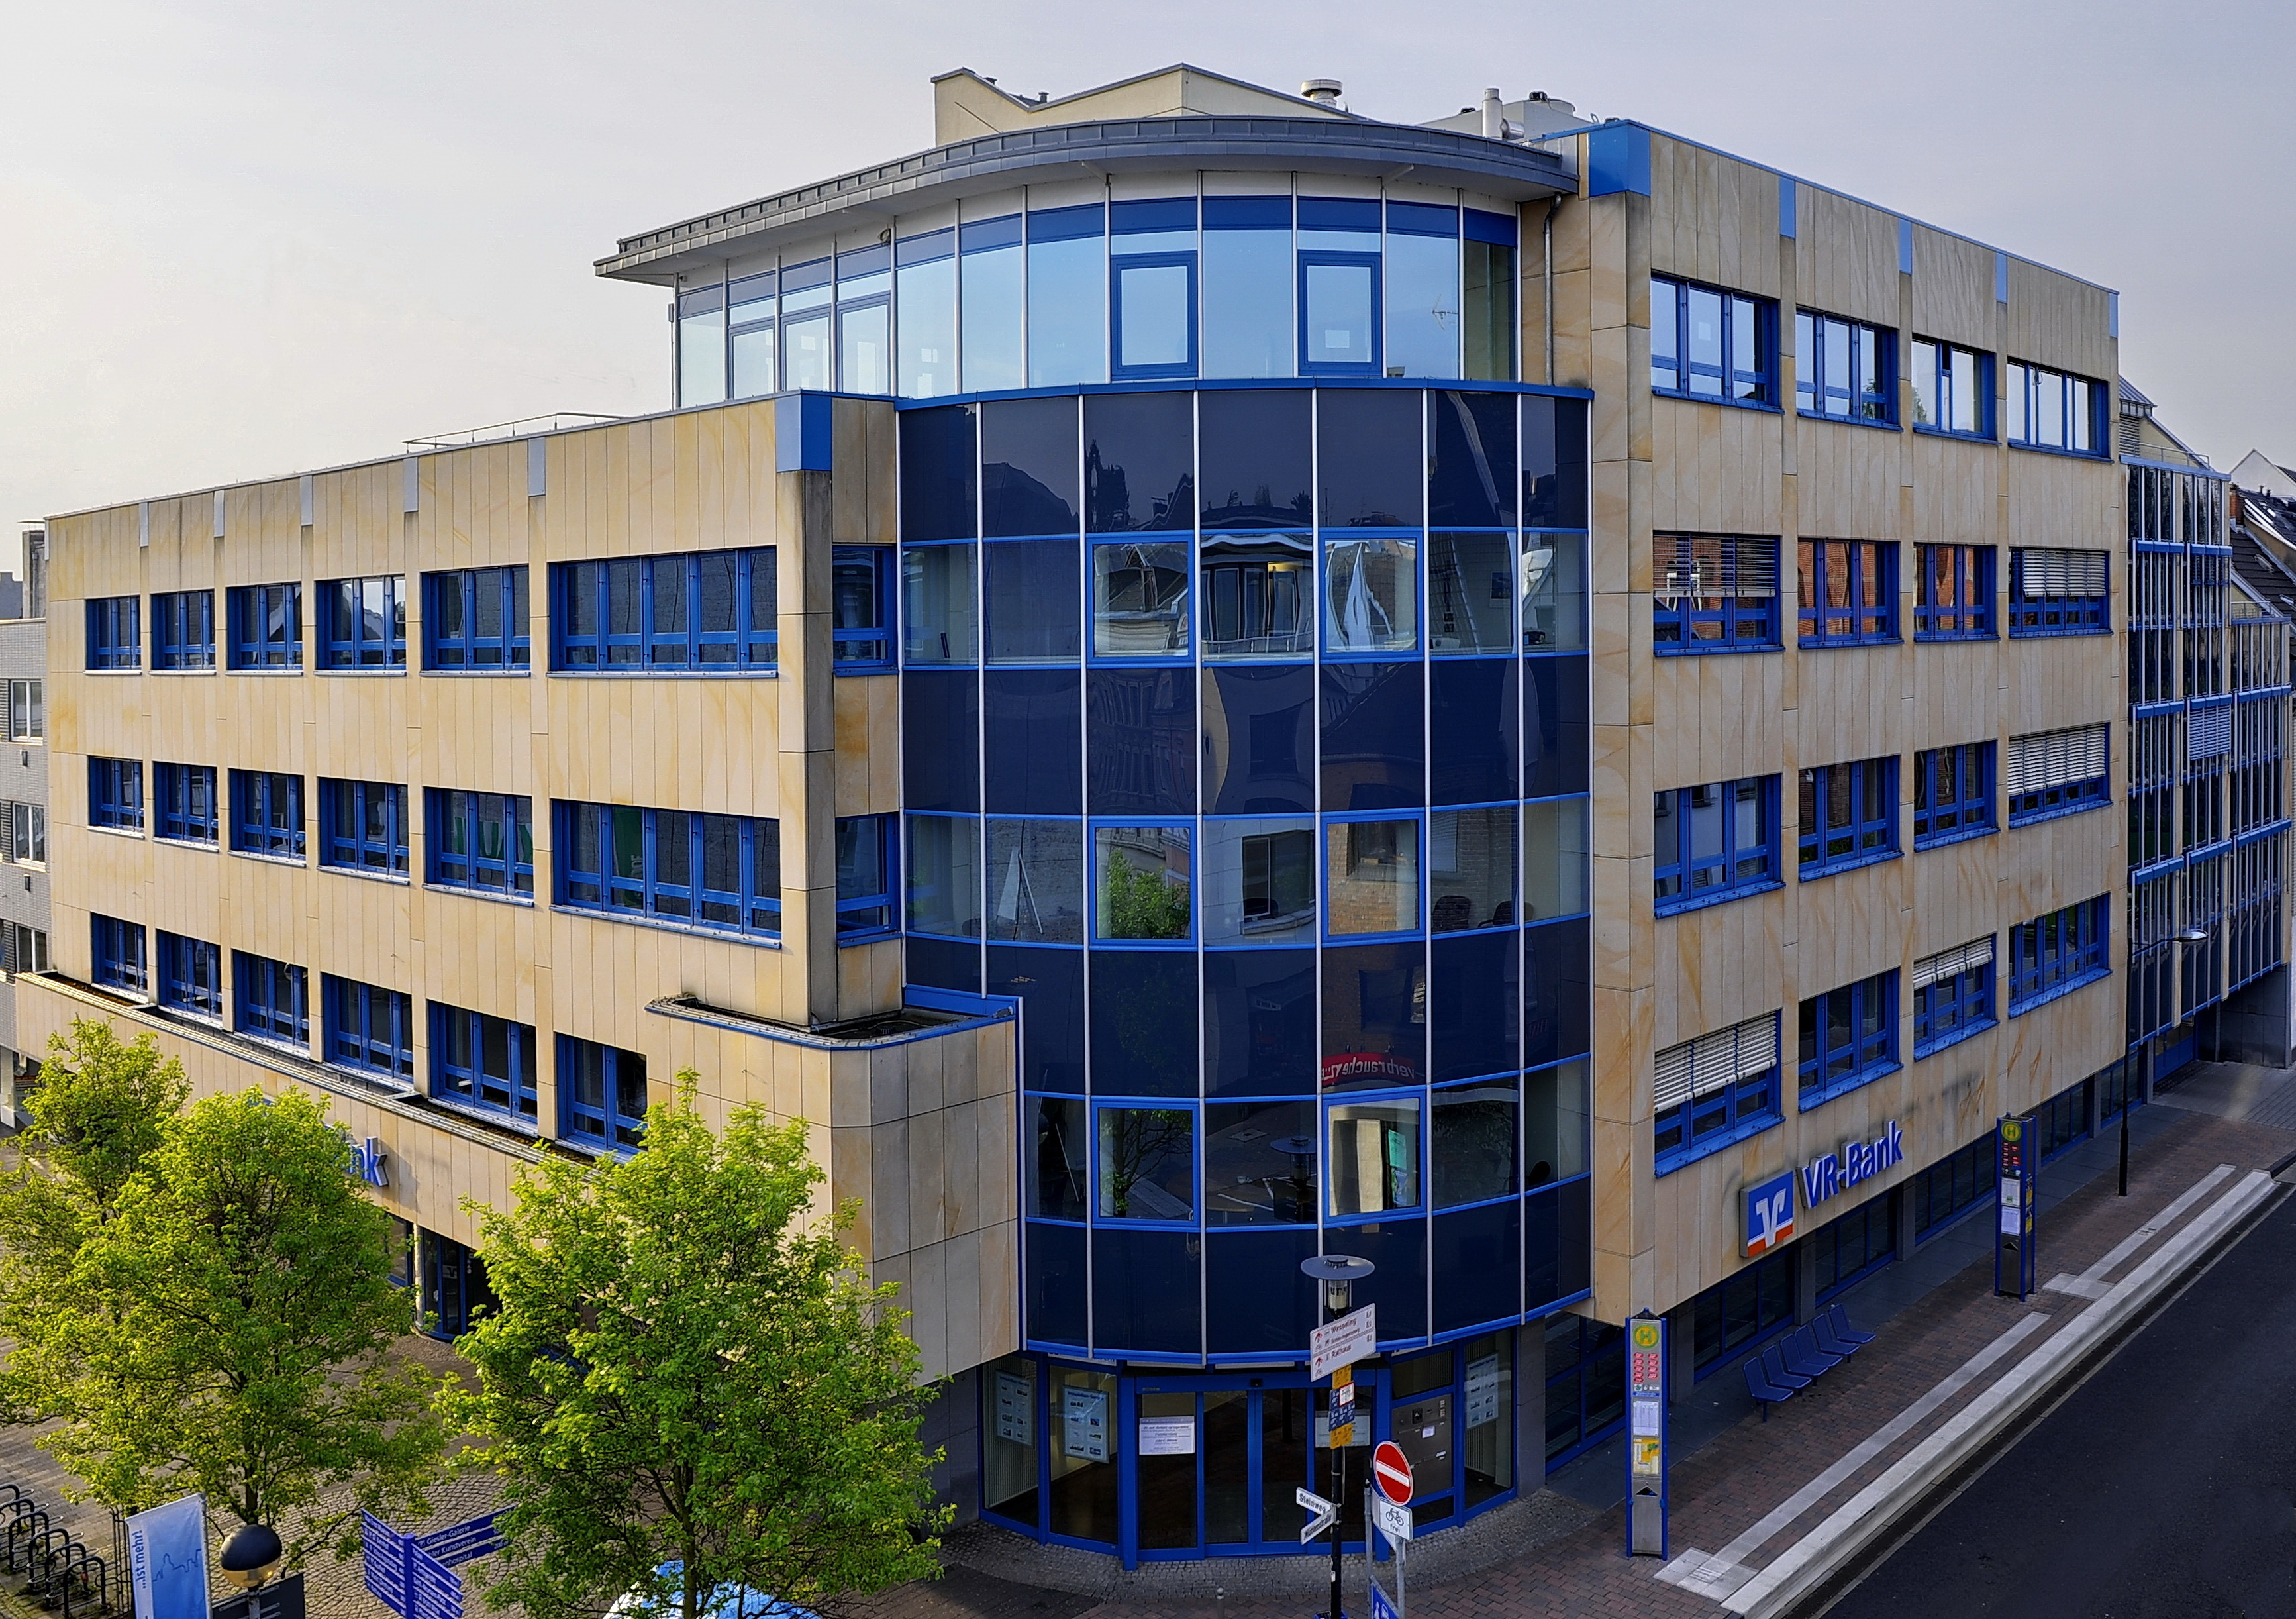 Vr Bank Rhein Erft Bruhl